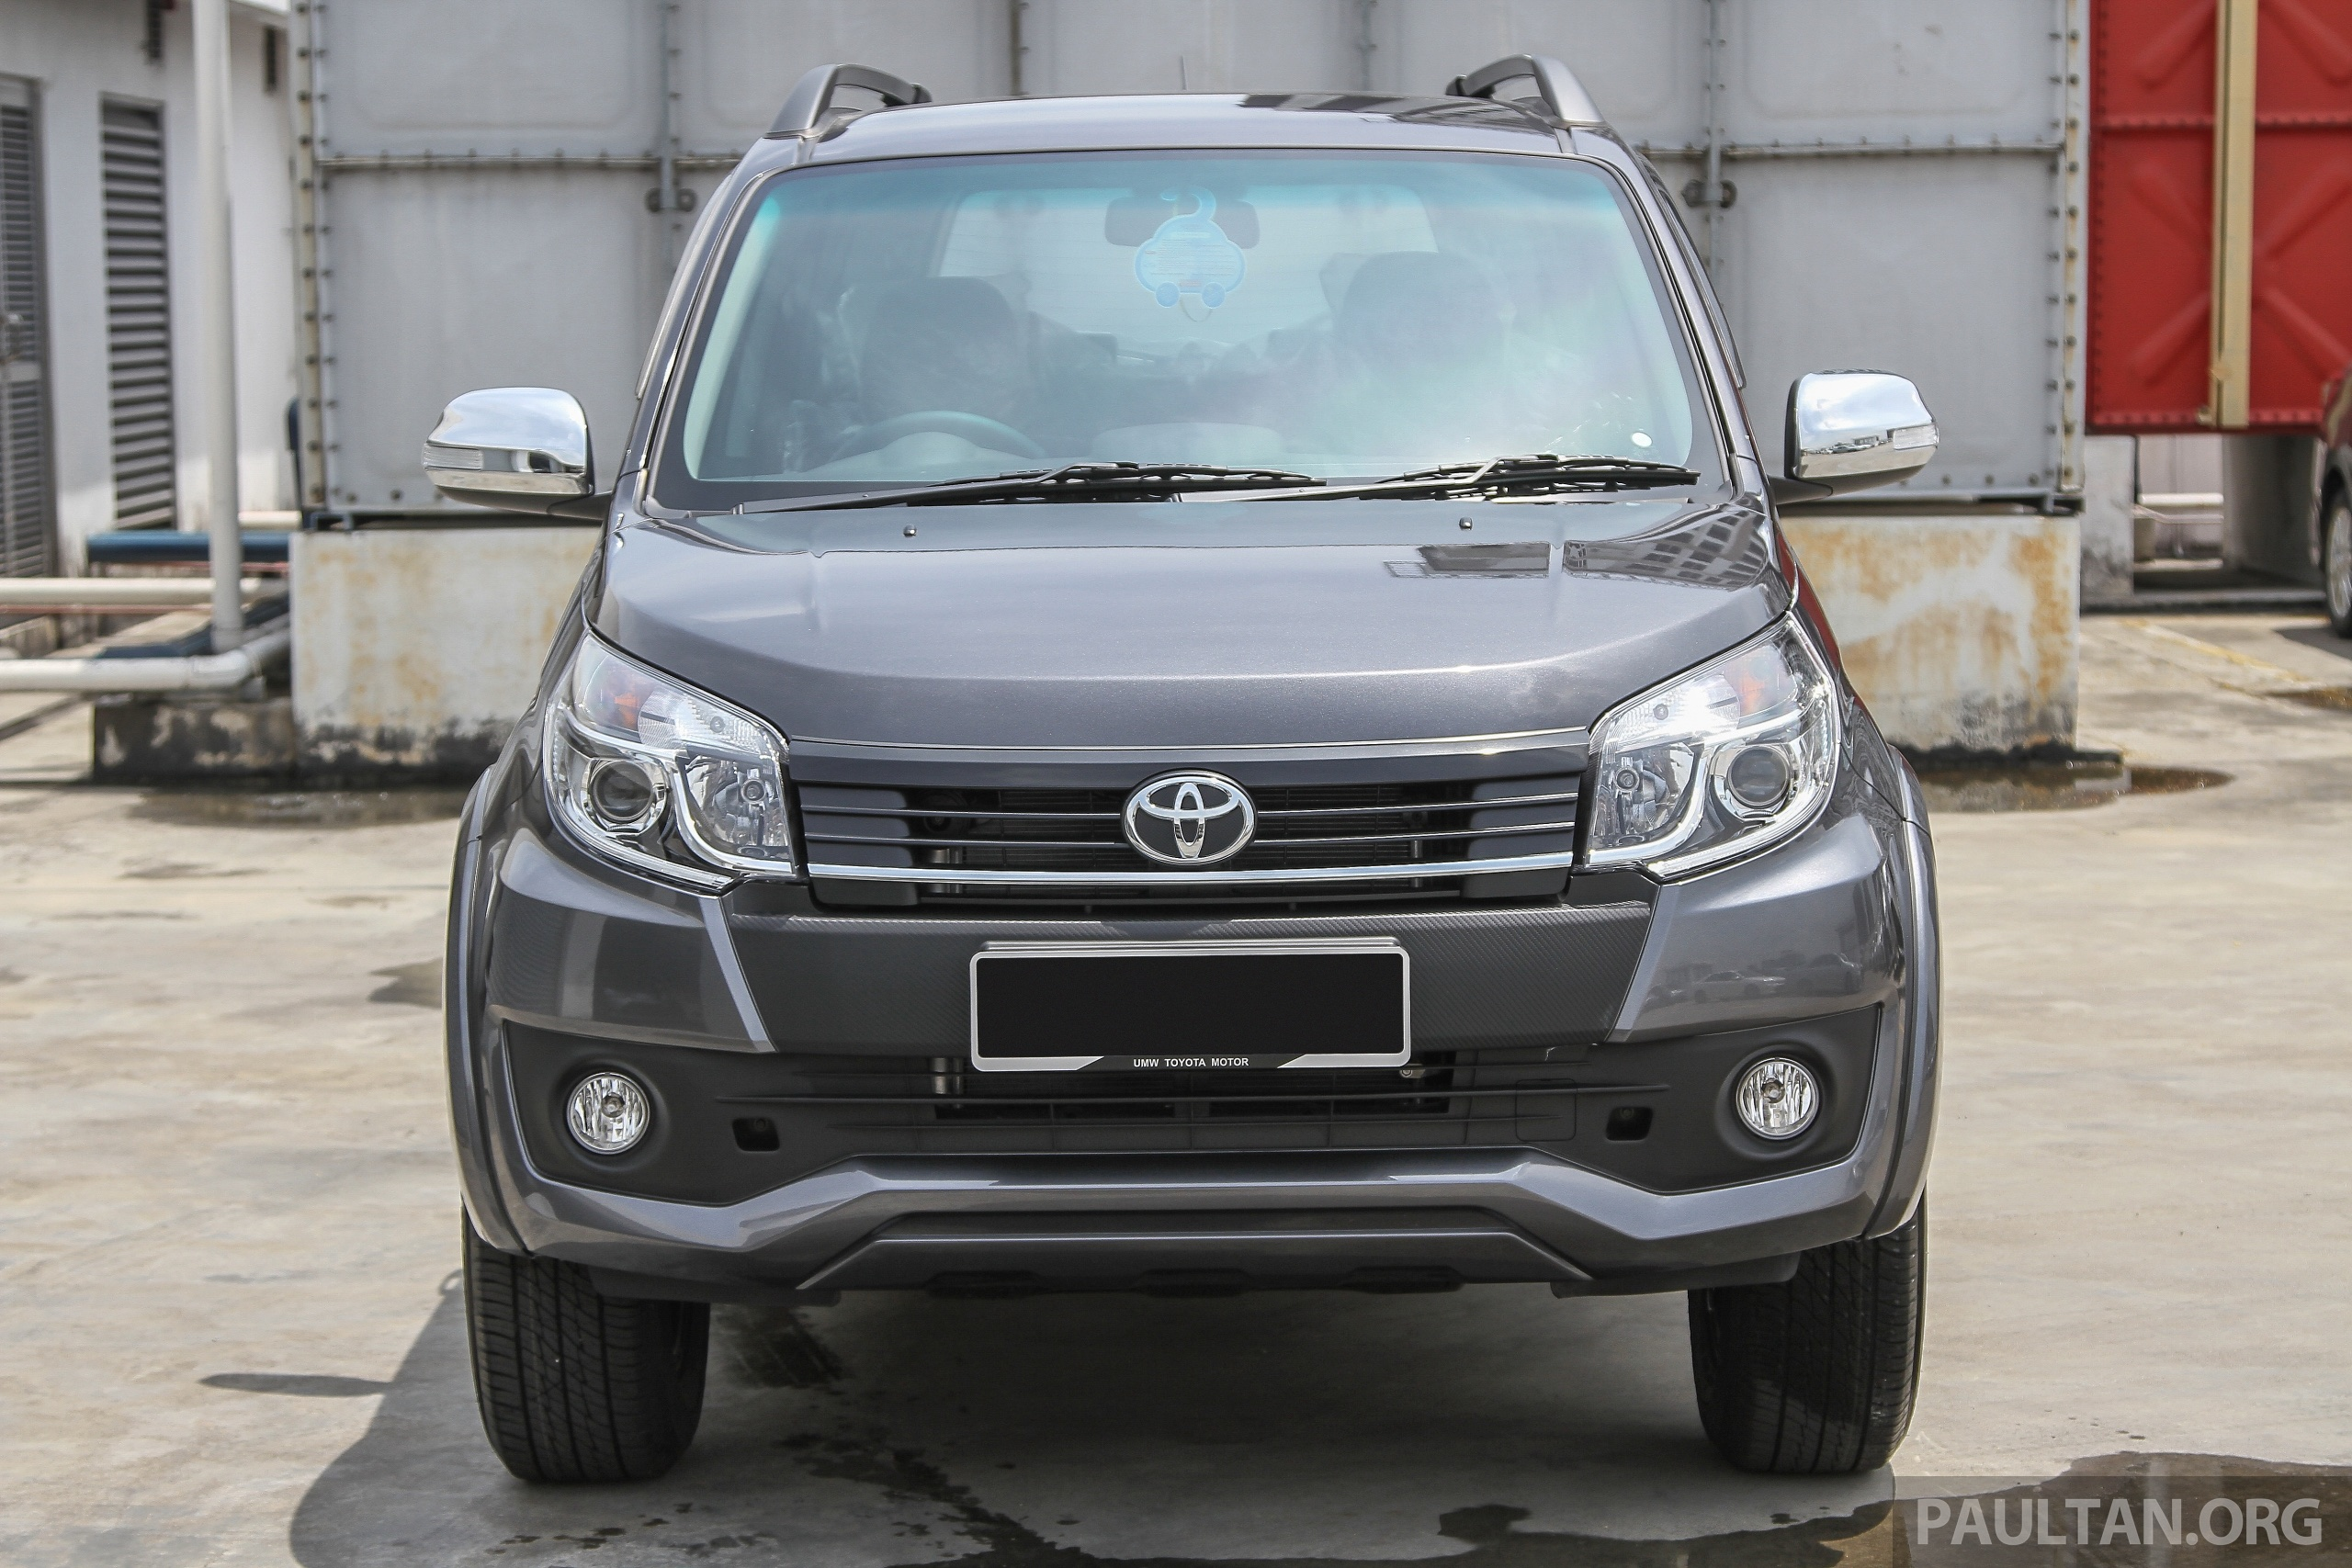 Kekurangan Toyota Rush 2015 Perbandingan Harga